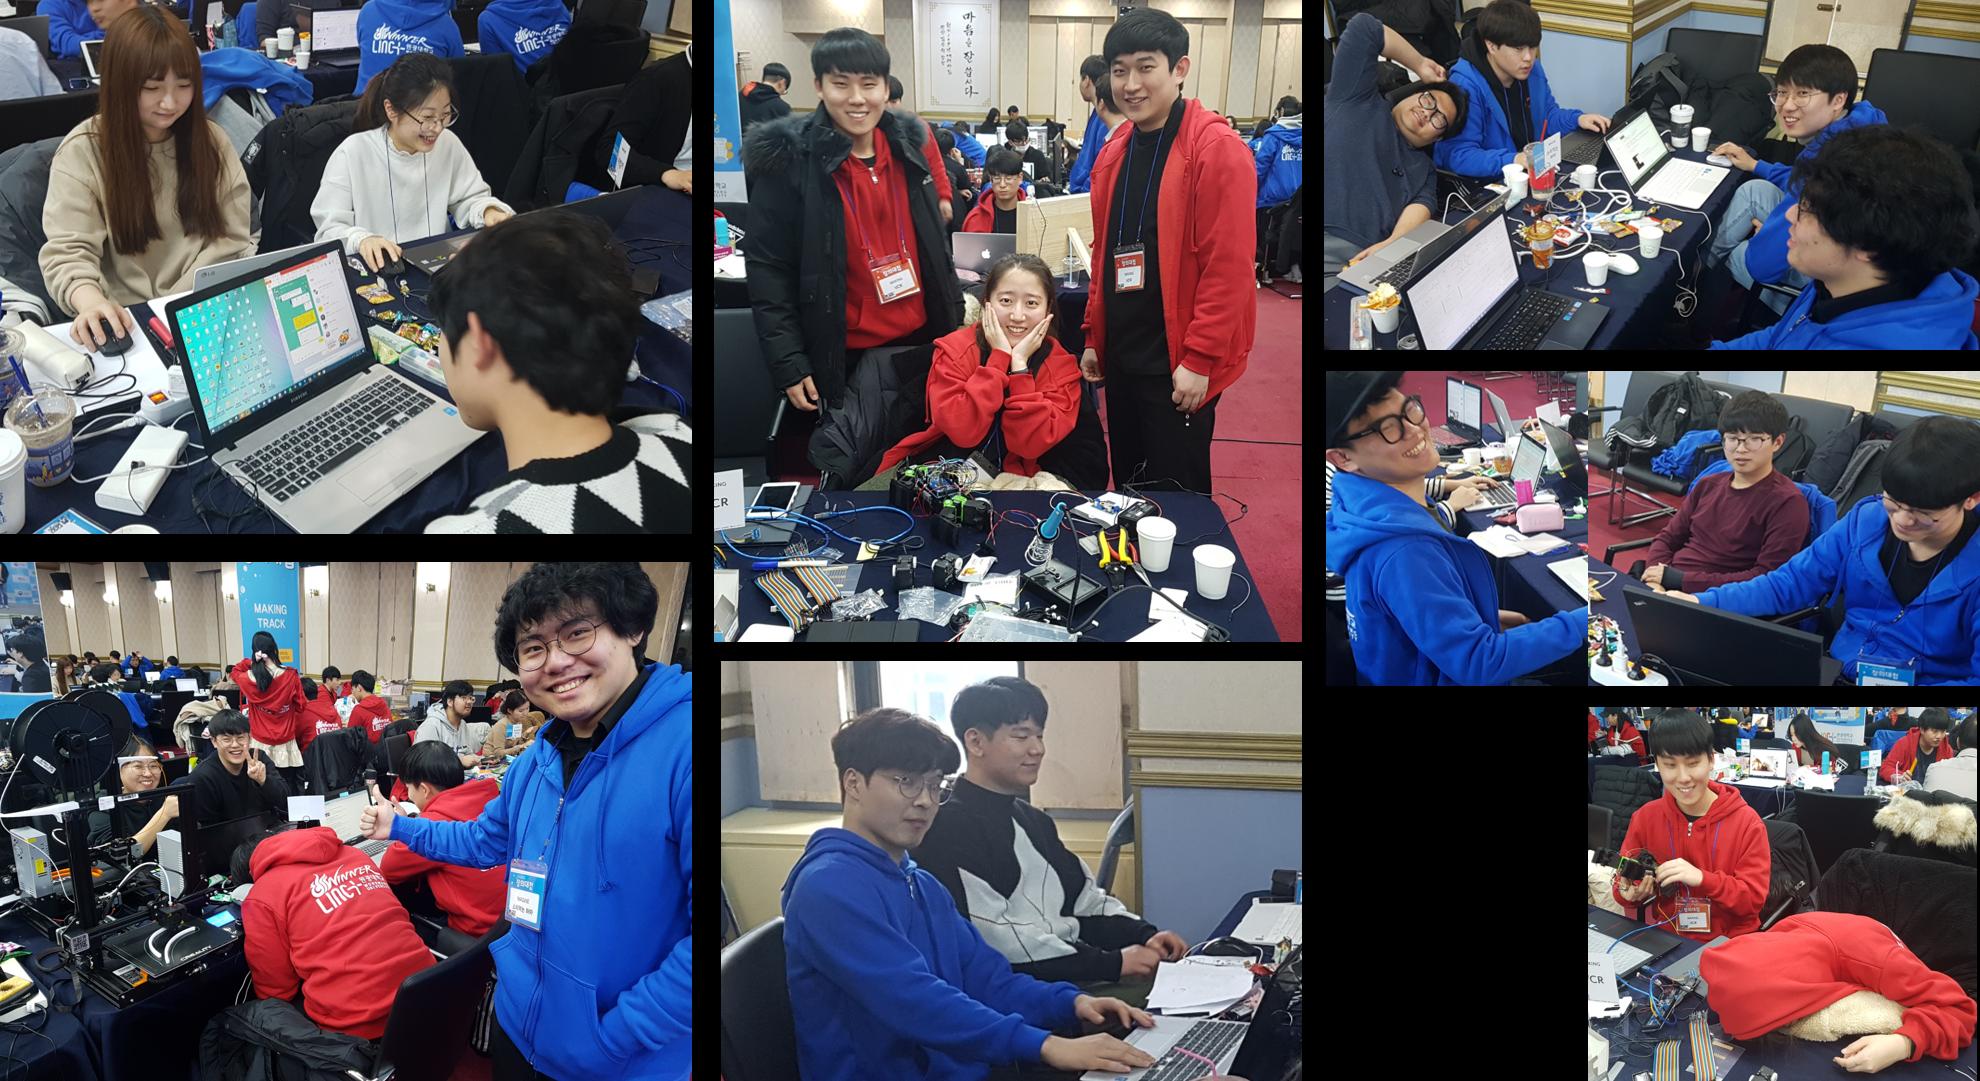 2019-2nd-창의대첩.png